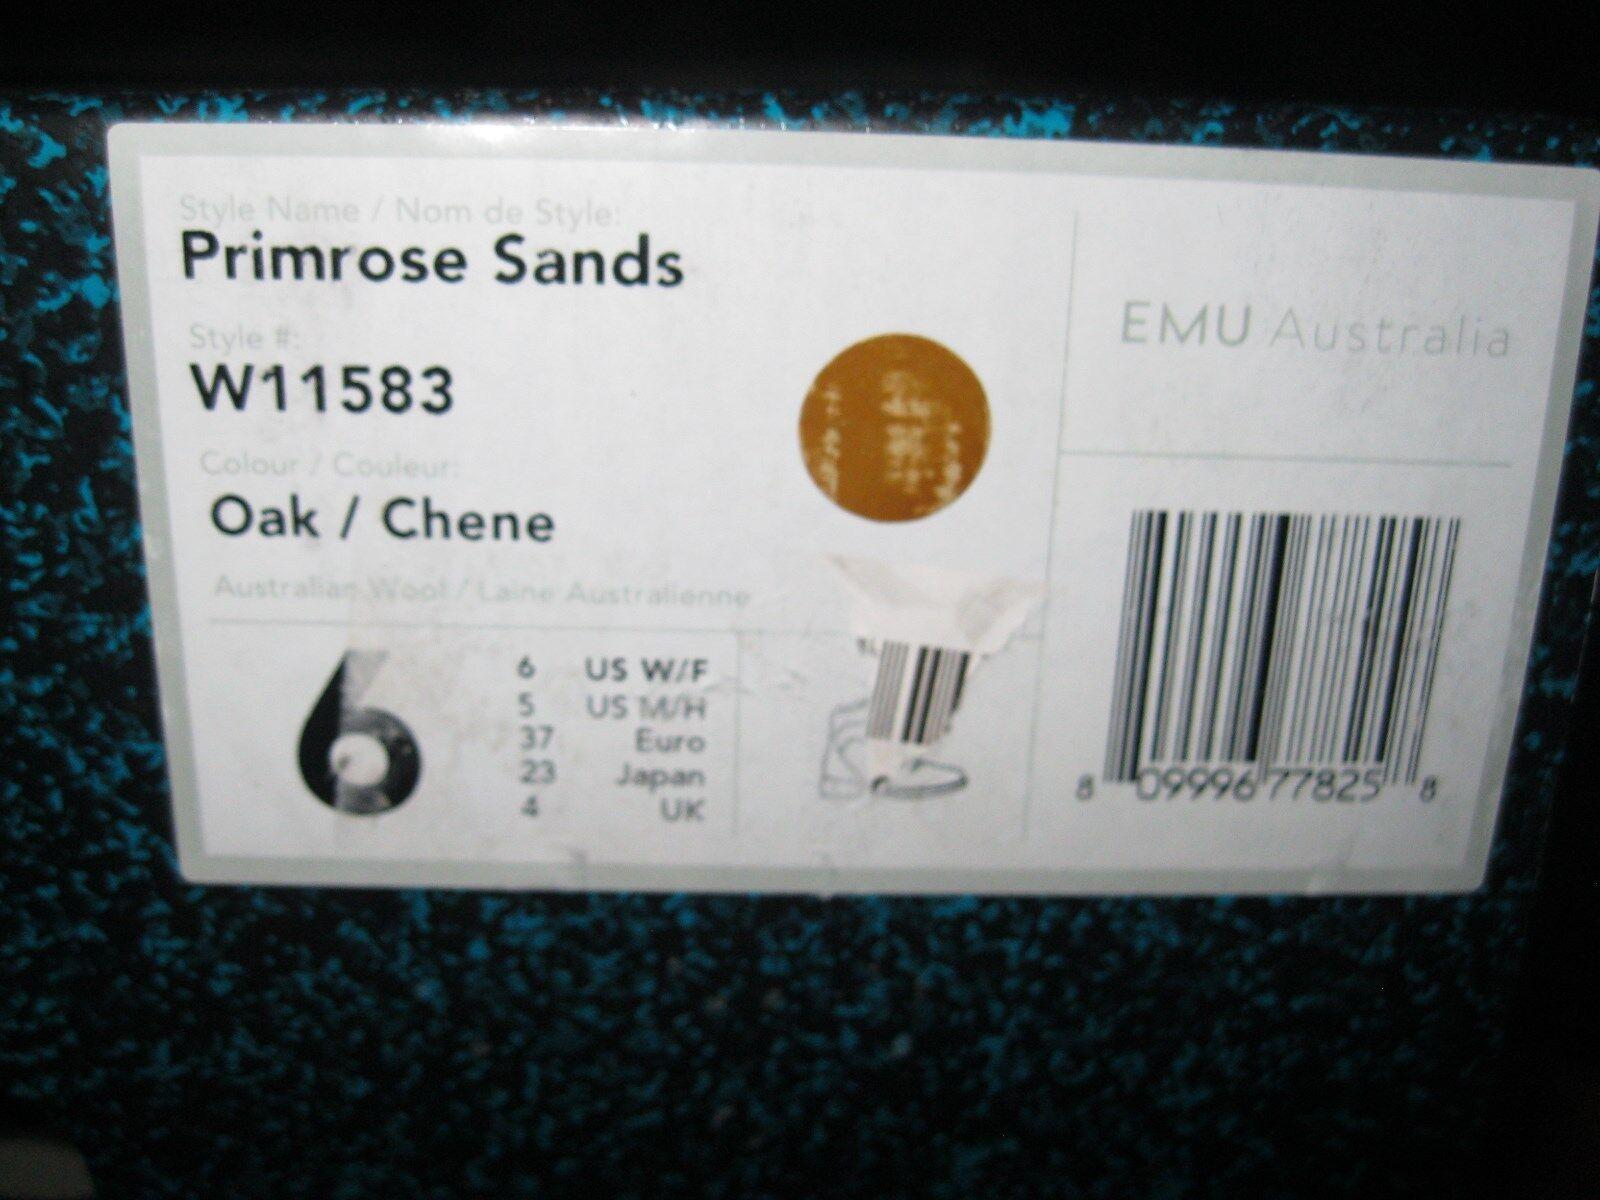 EMU Mujer Nuevo Primrose Arenas Bota Impermeable W11583 Nuevo Mujer En Caja Color Roble cf32a0